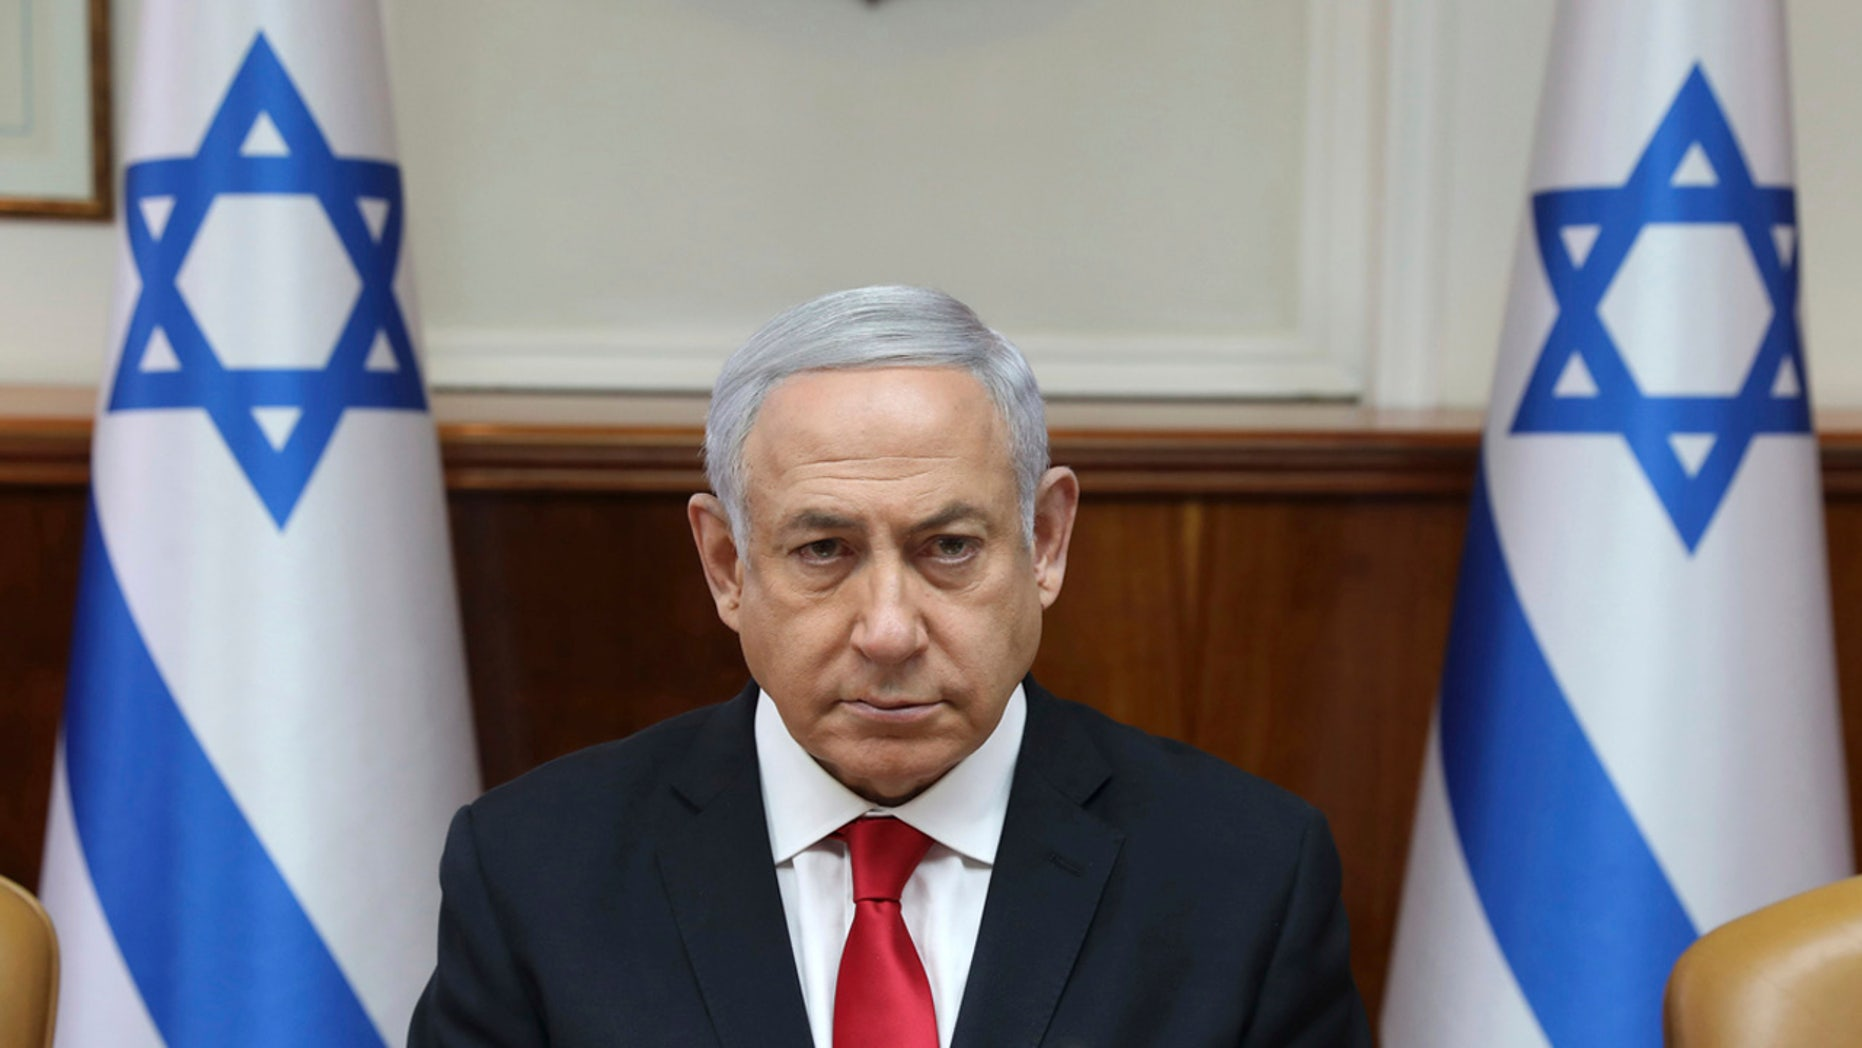 Israeli Prime Minister Benjamin Netanyahu attends the weekly cabinet meeting at his office in Jerusalem, Israel, Sunday, May 5, 2019. (Abir Sultan/Pool Photo via AP)